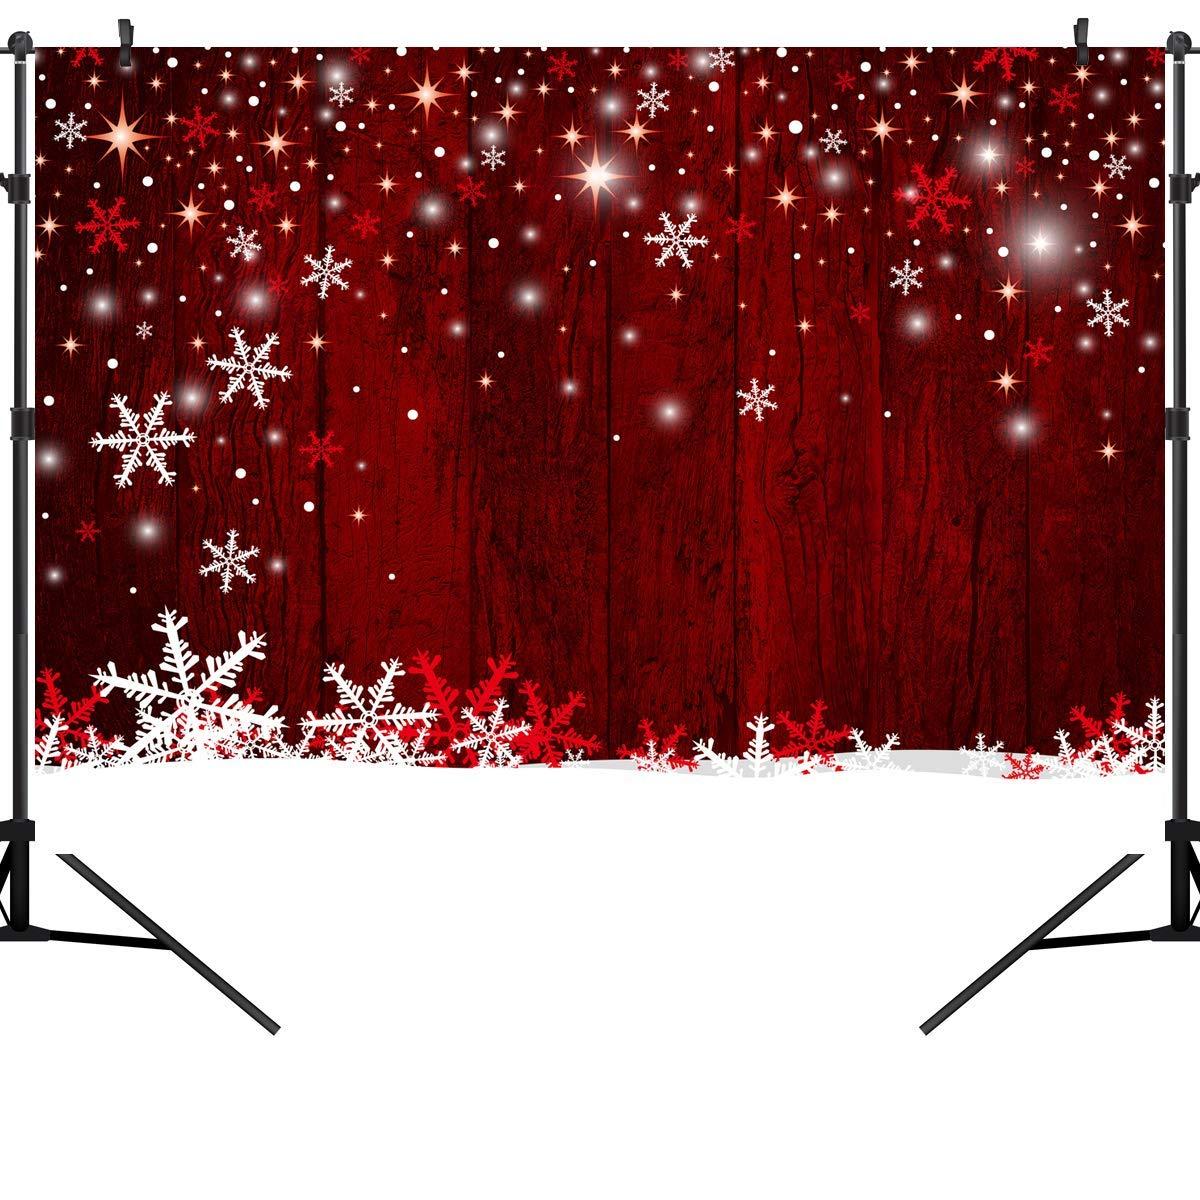 CdHBH 10X8フィート クリスマステーマ 暖炉 ビニール写真背景写真 スタジオ小道具 CEM06C 7X5FT CEM08 B07LB5HGNM